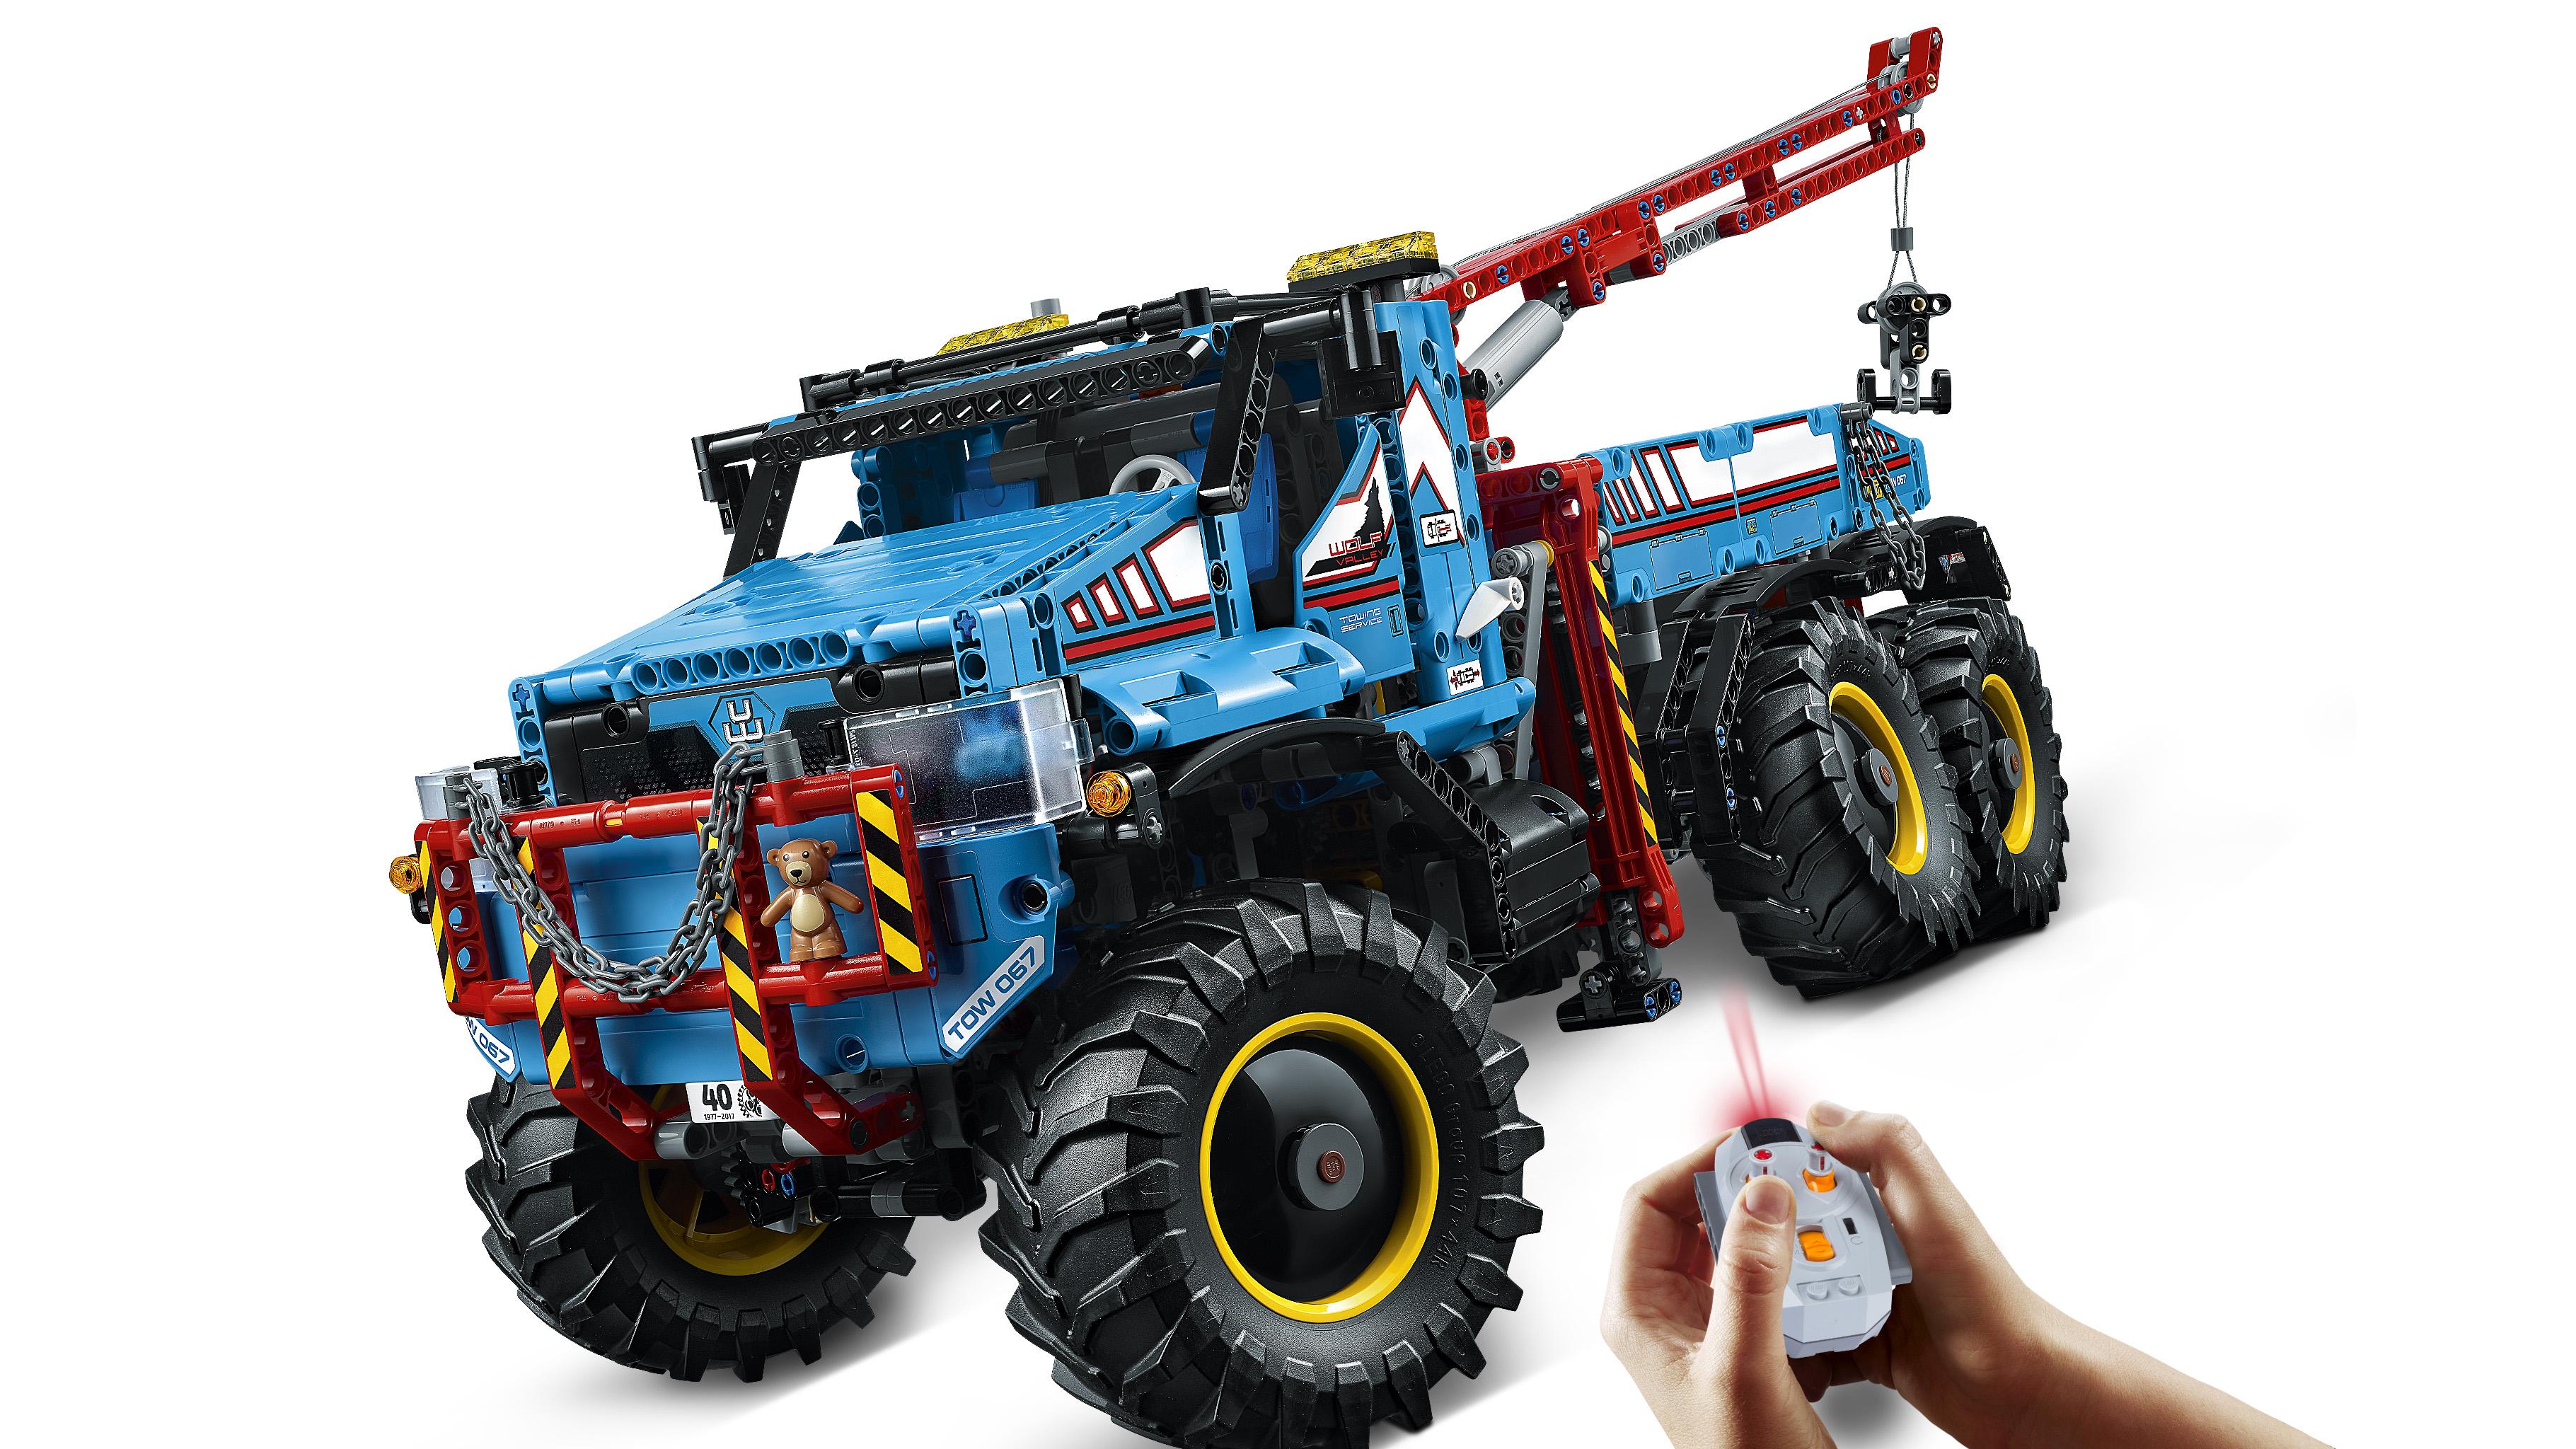 lego technic 42070 6x6 all terrain tow truck. Black Bedroom Furniture Sets. Home Design Ideas